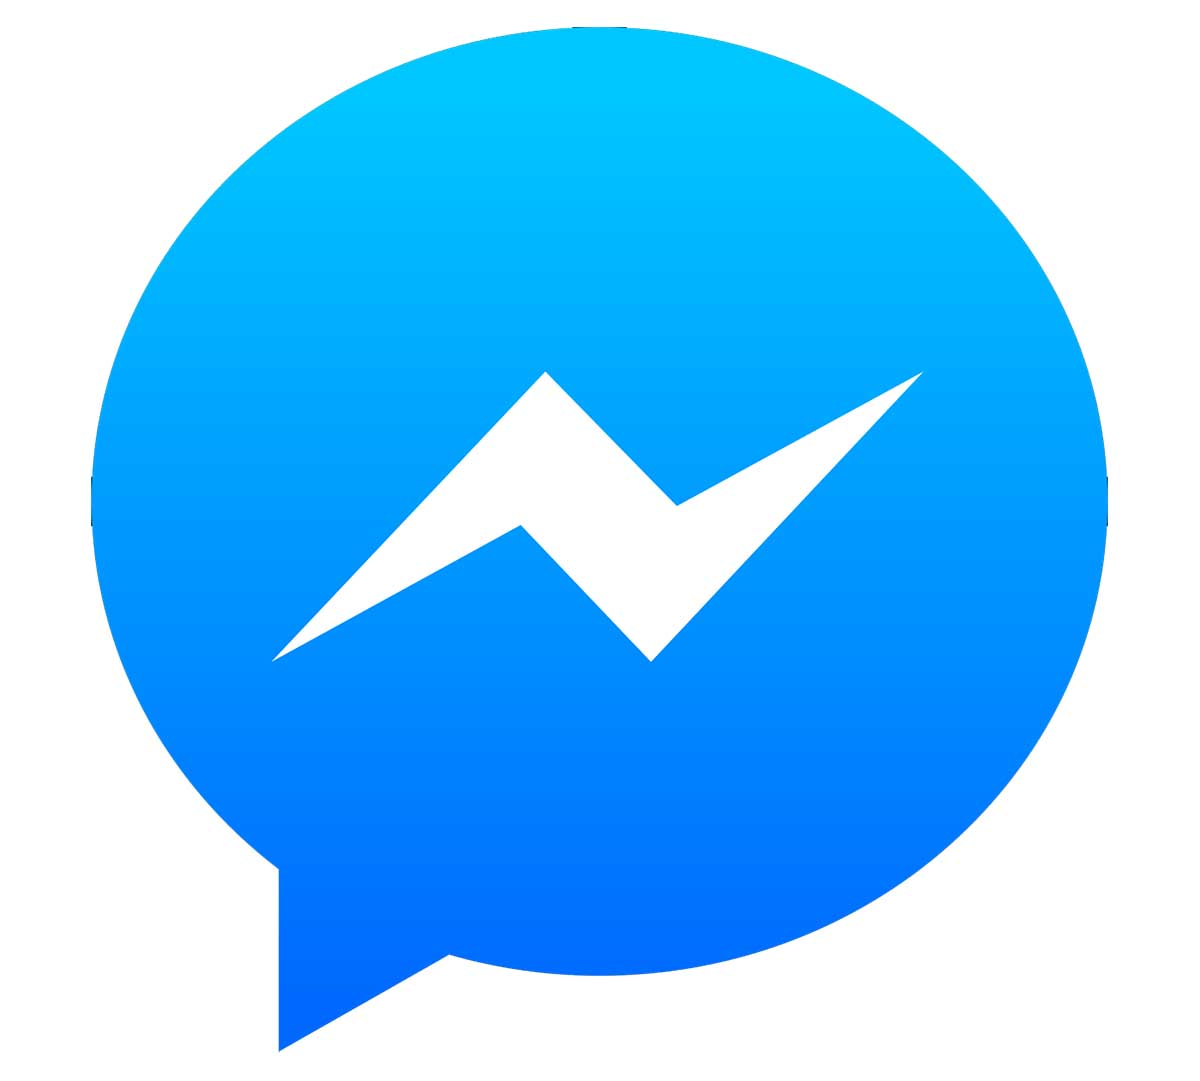 Así es el tema oscuro de Facebook Messenger Messenger